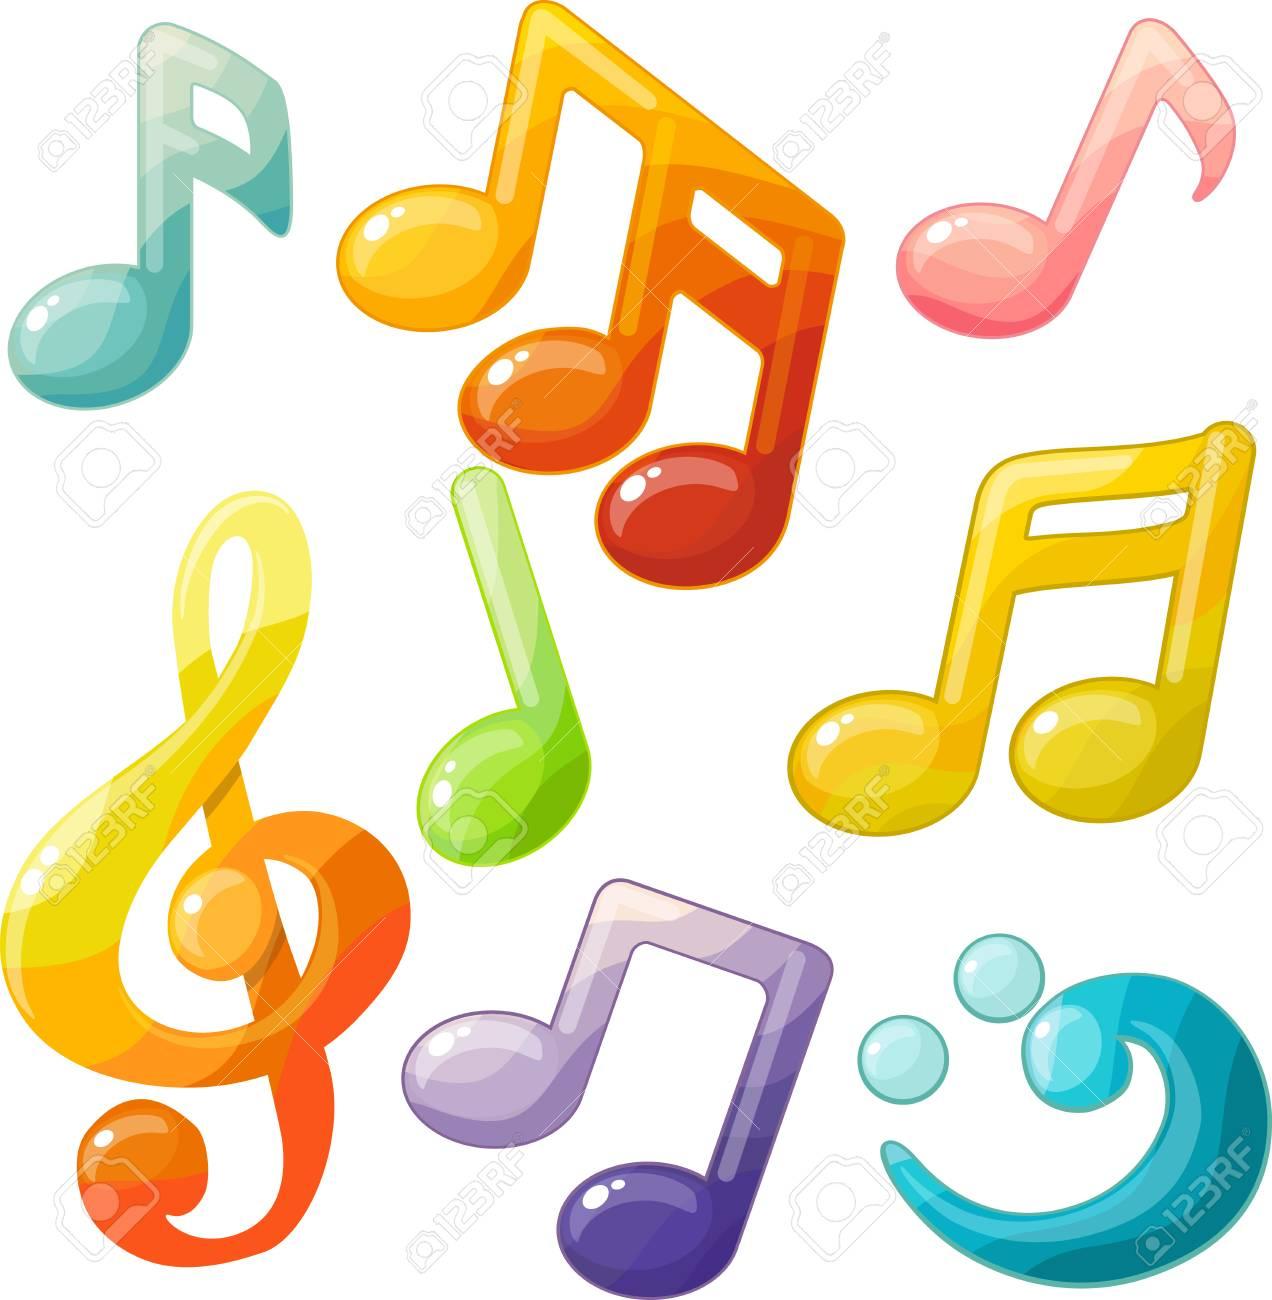 Decorative musical cartoon symbols - 93481442